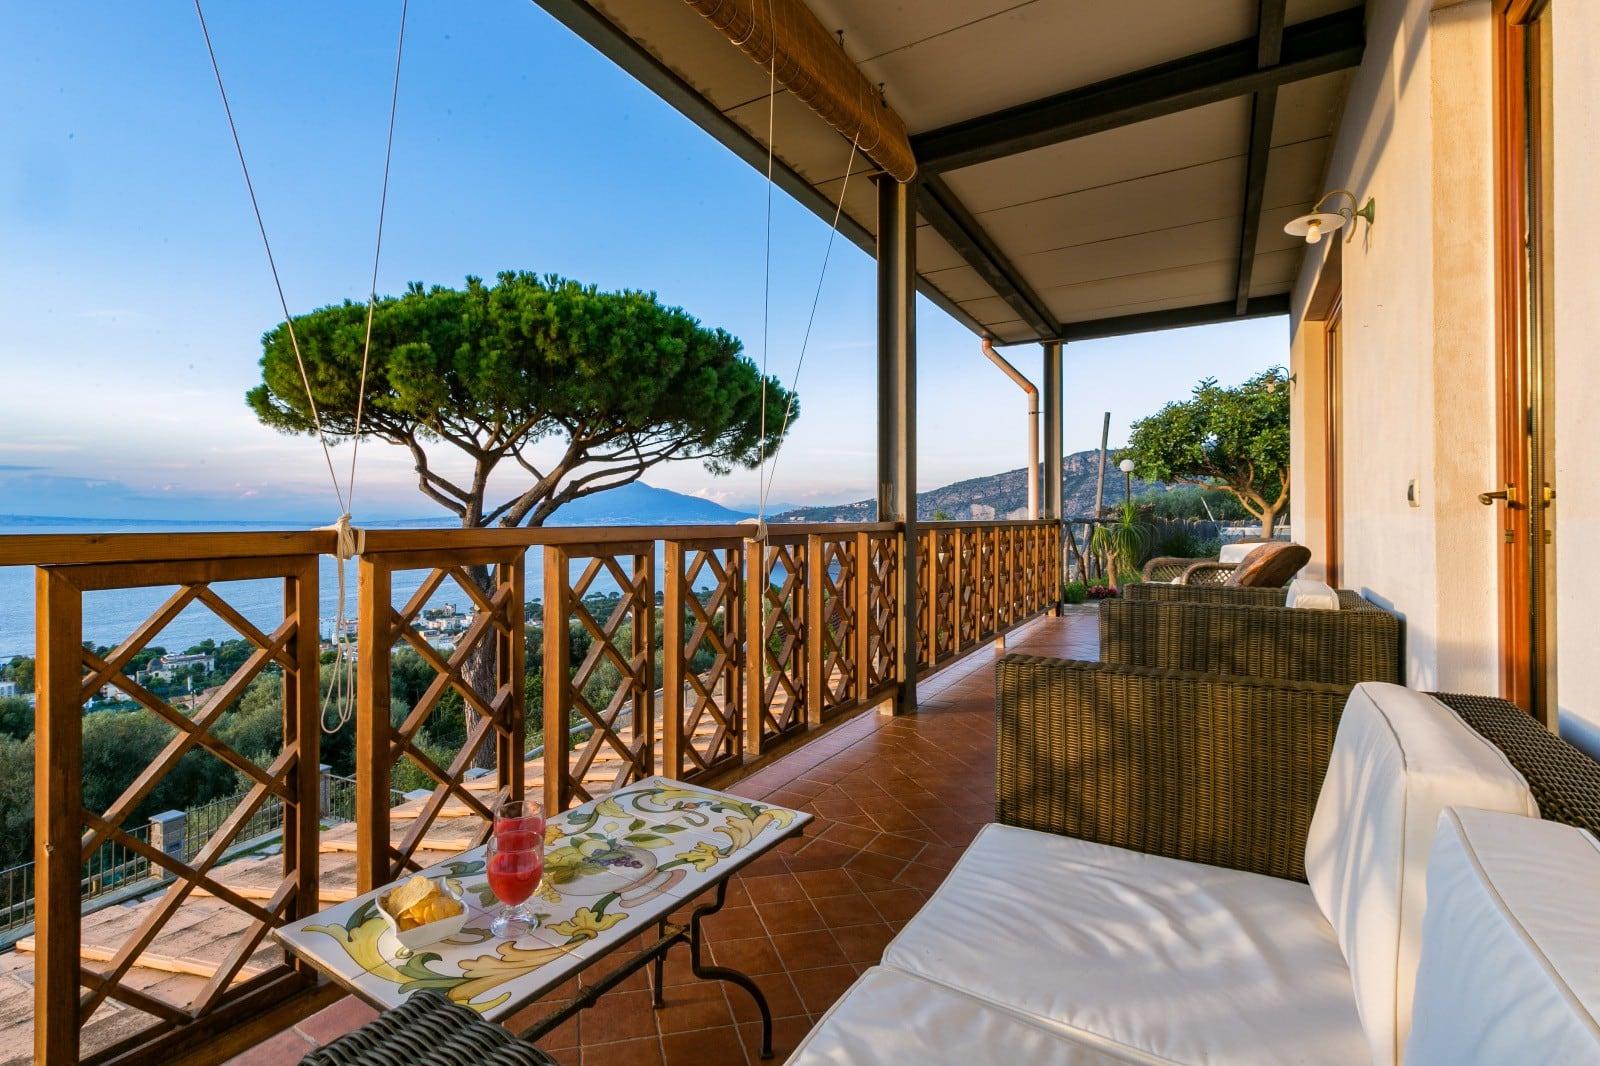 Belvedere Luxury Villa Sorrento